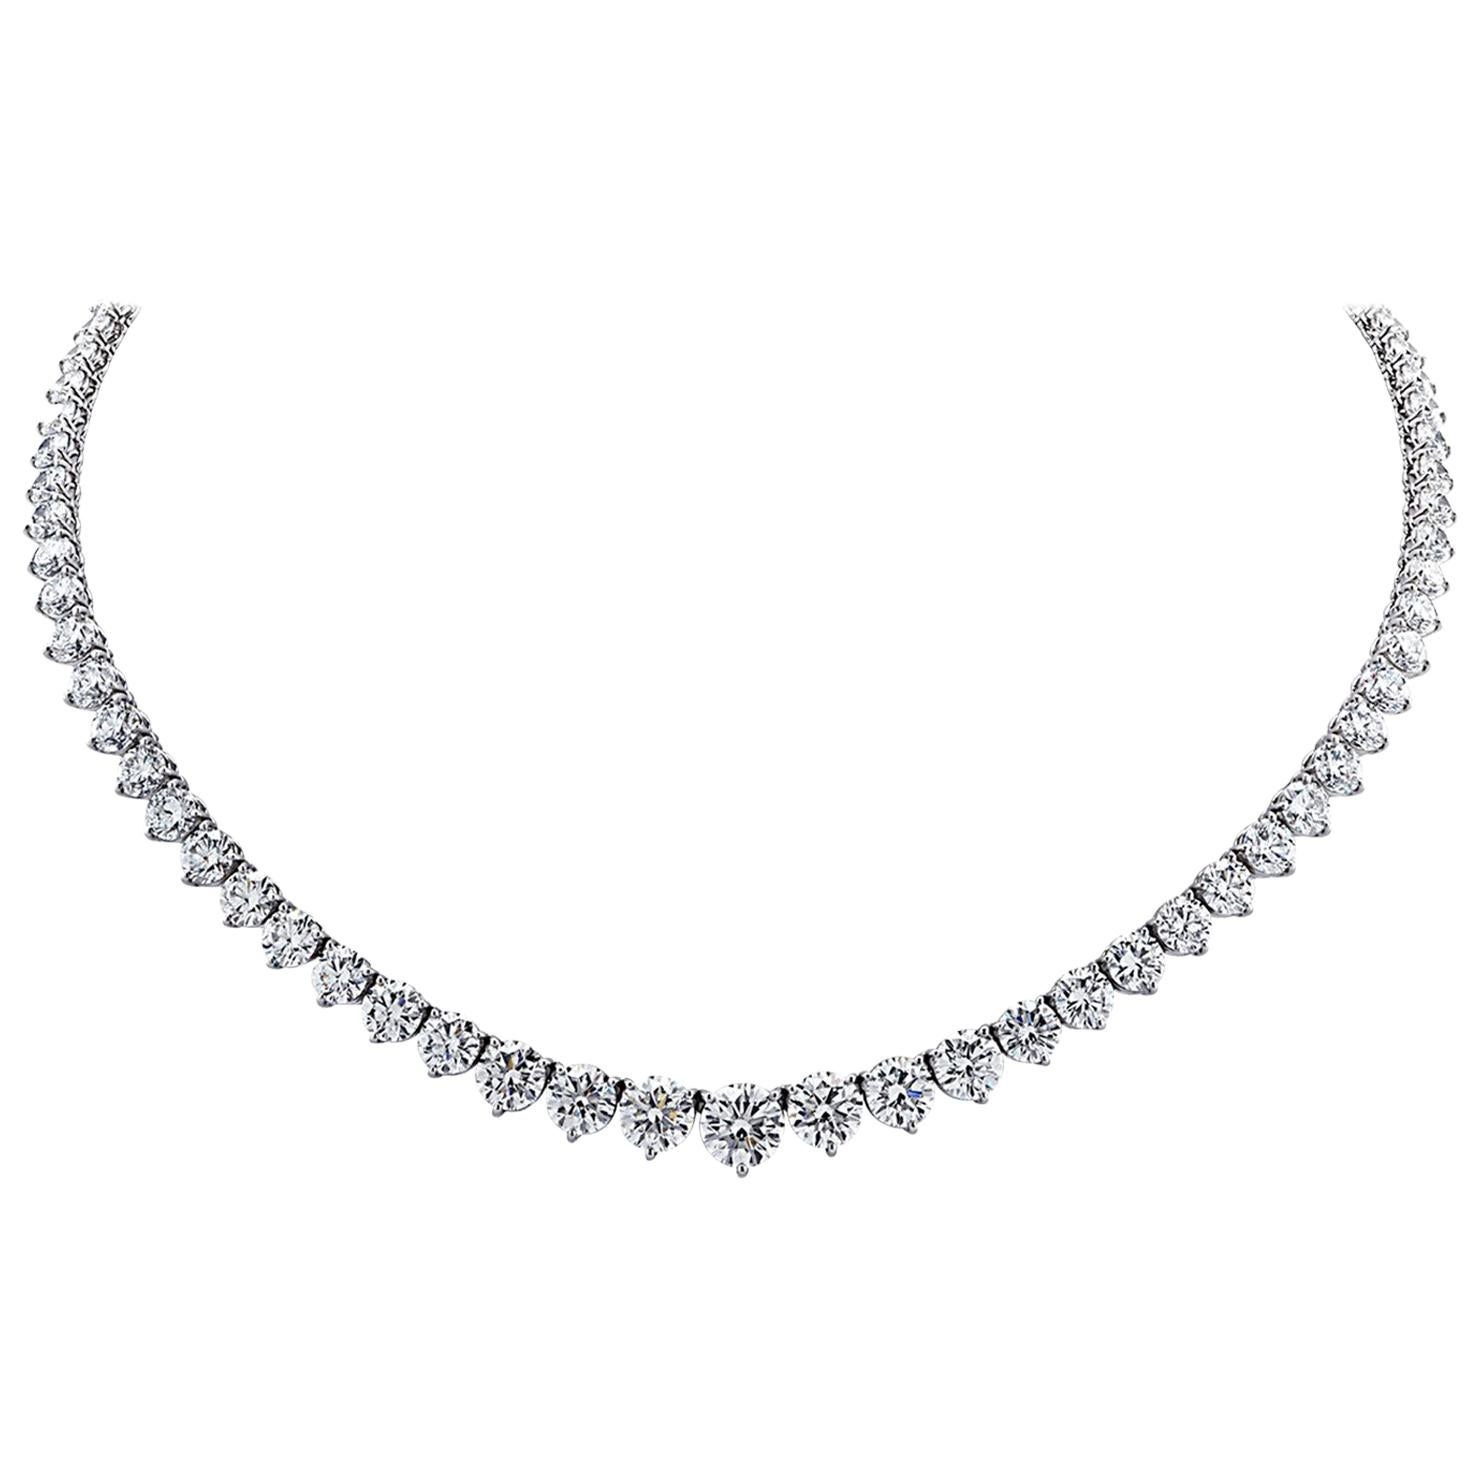 10 Carat Diamond Tennis Riviera Necklace 18 Karat F Color VS Clarity